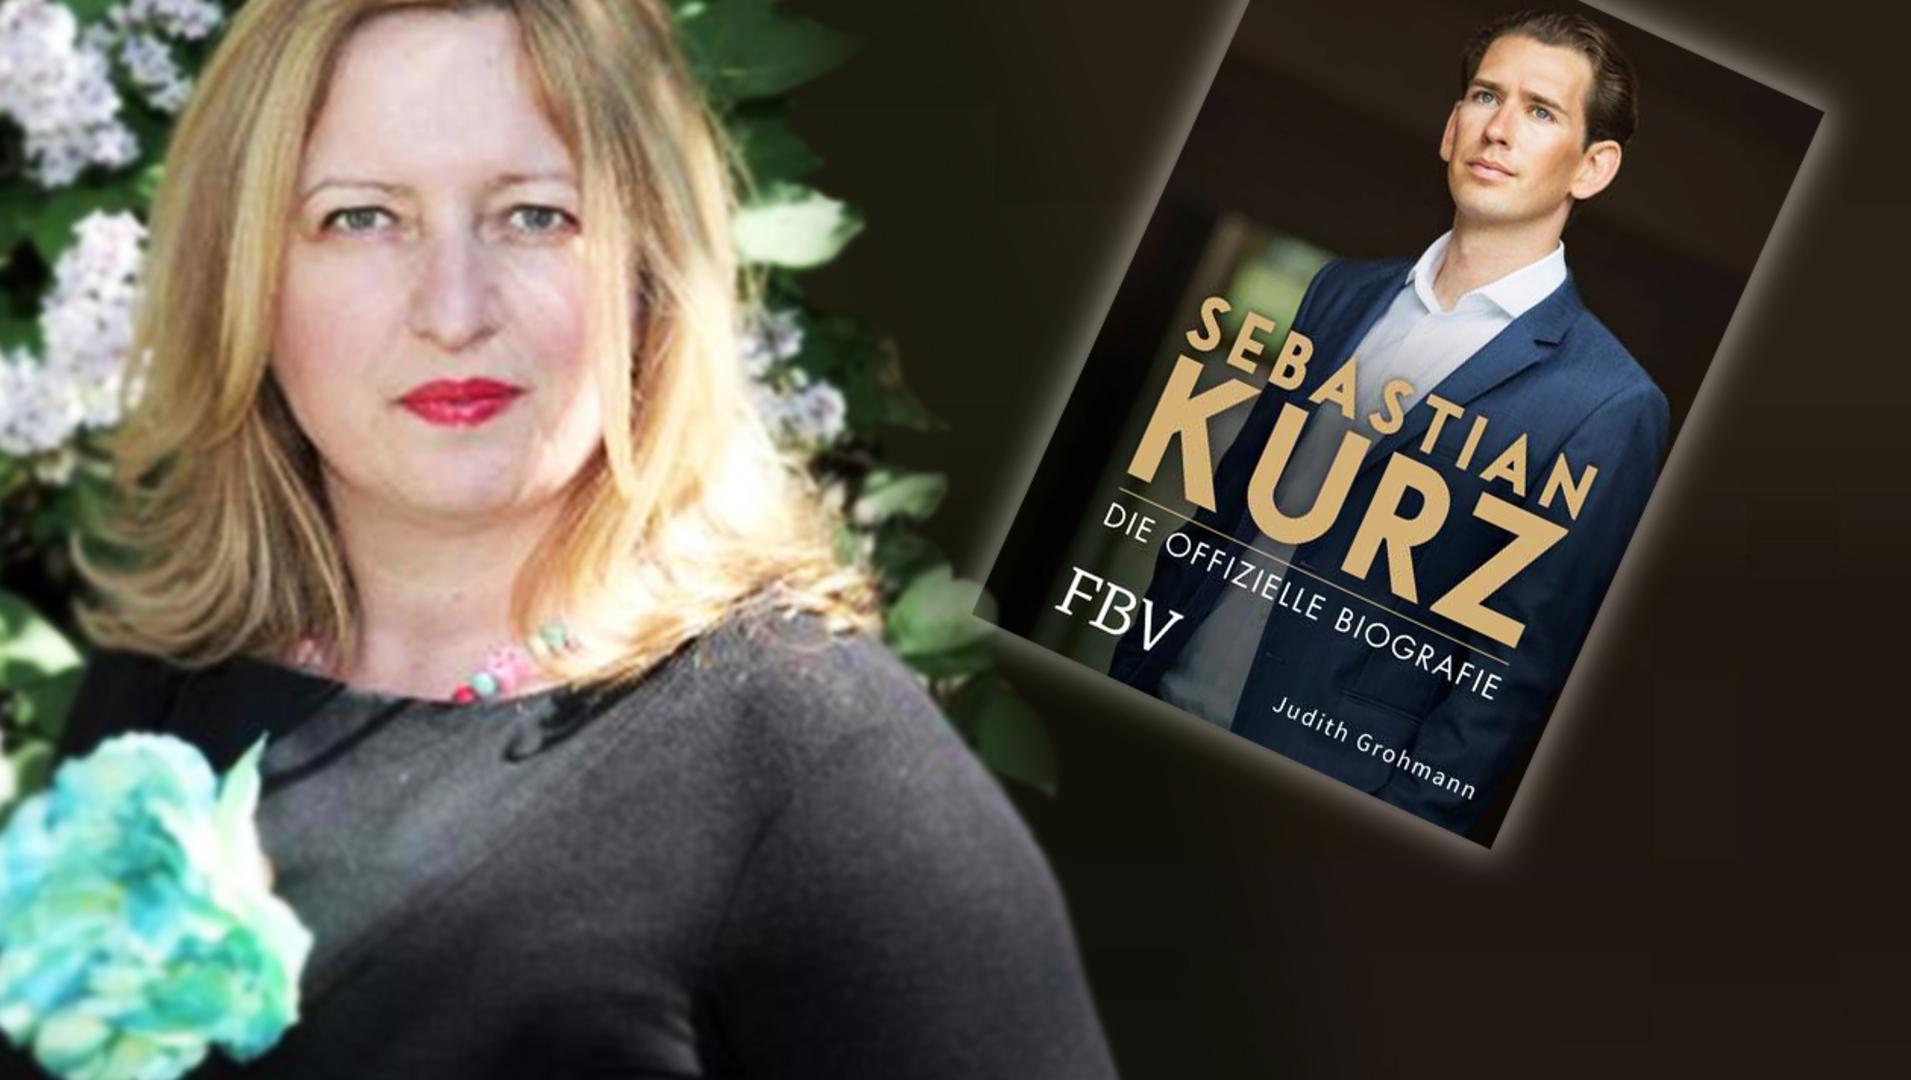 Sebastian Kurz Ein Lebenslauf Ohne Studium